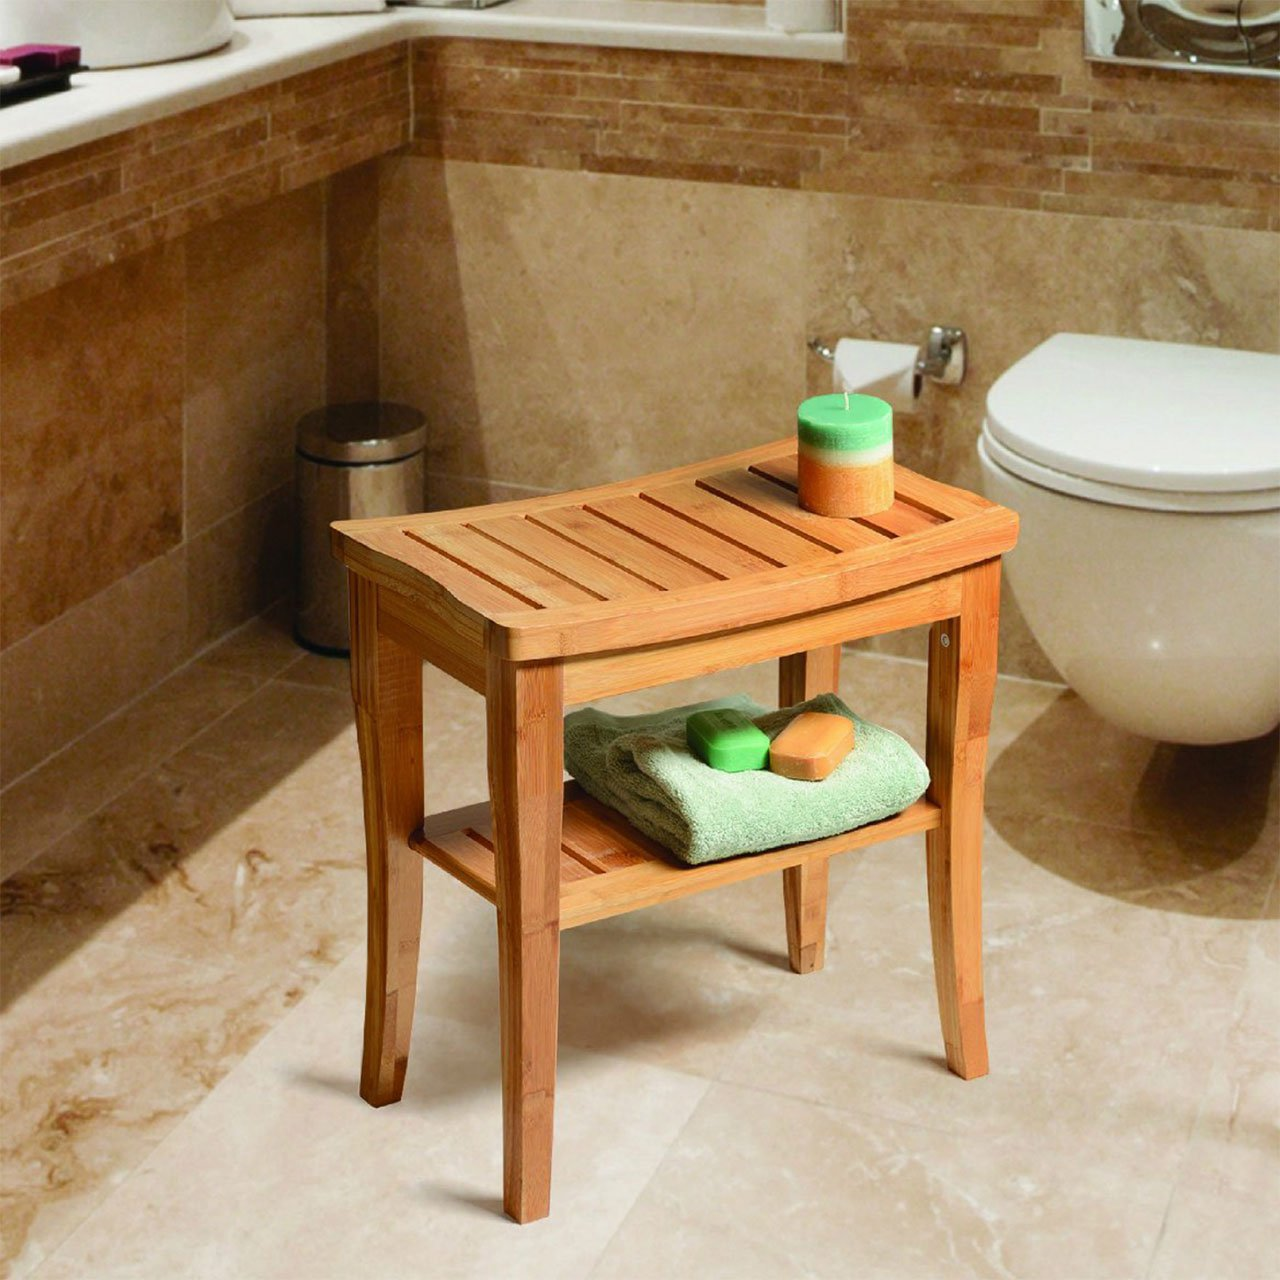 Water-friendly Bamboo Shower Bench with Storage Shelf